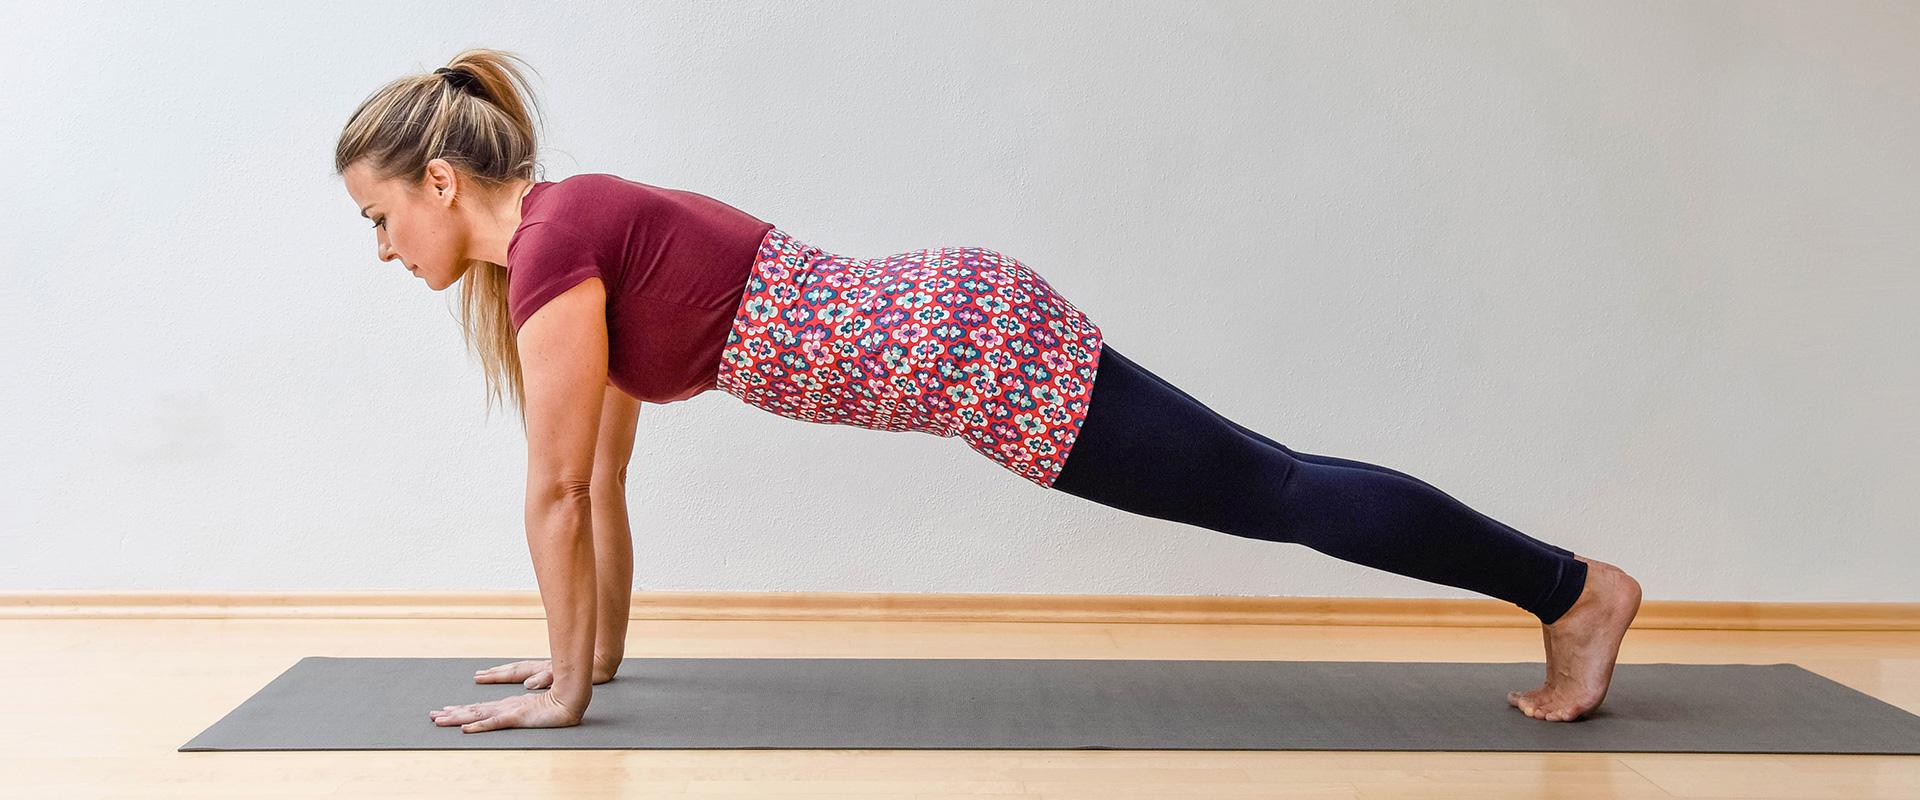 yogatube nierenwärmer cacheur bauchband backwarmer Baumwolljersey Yogakleidung Prilblumen rot petrol